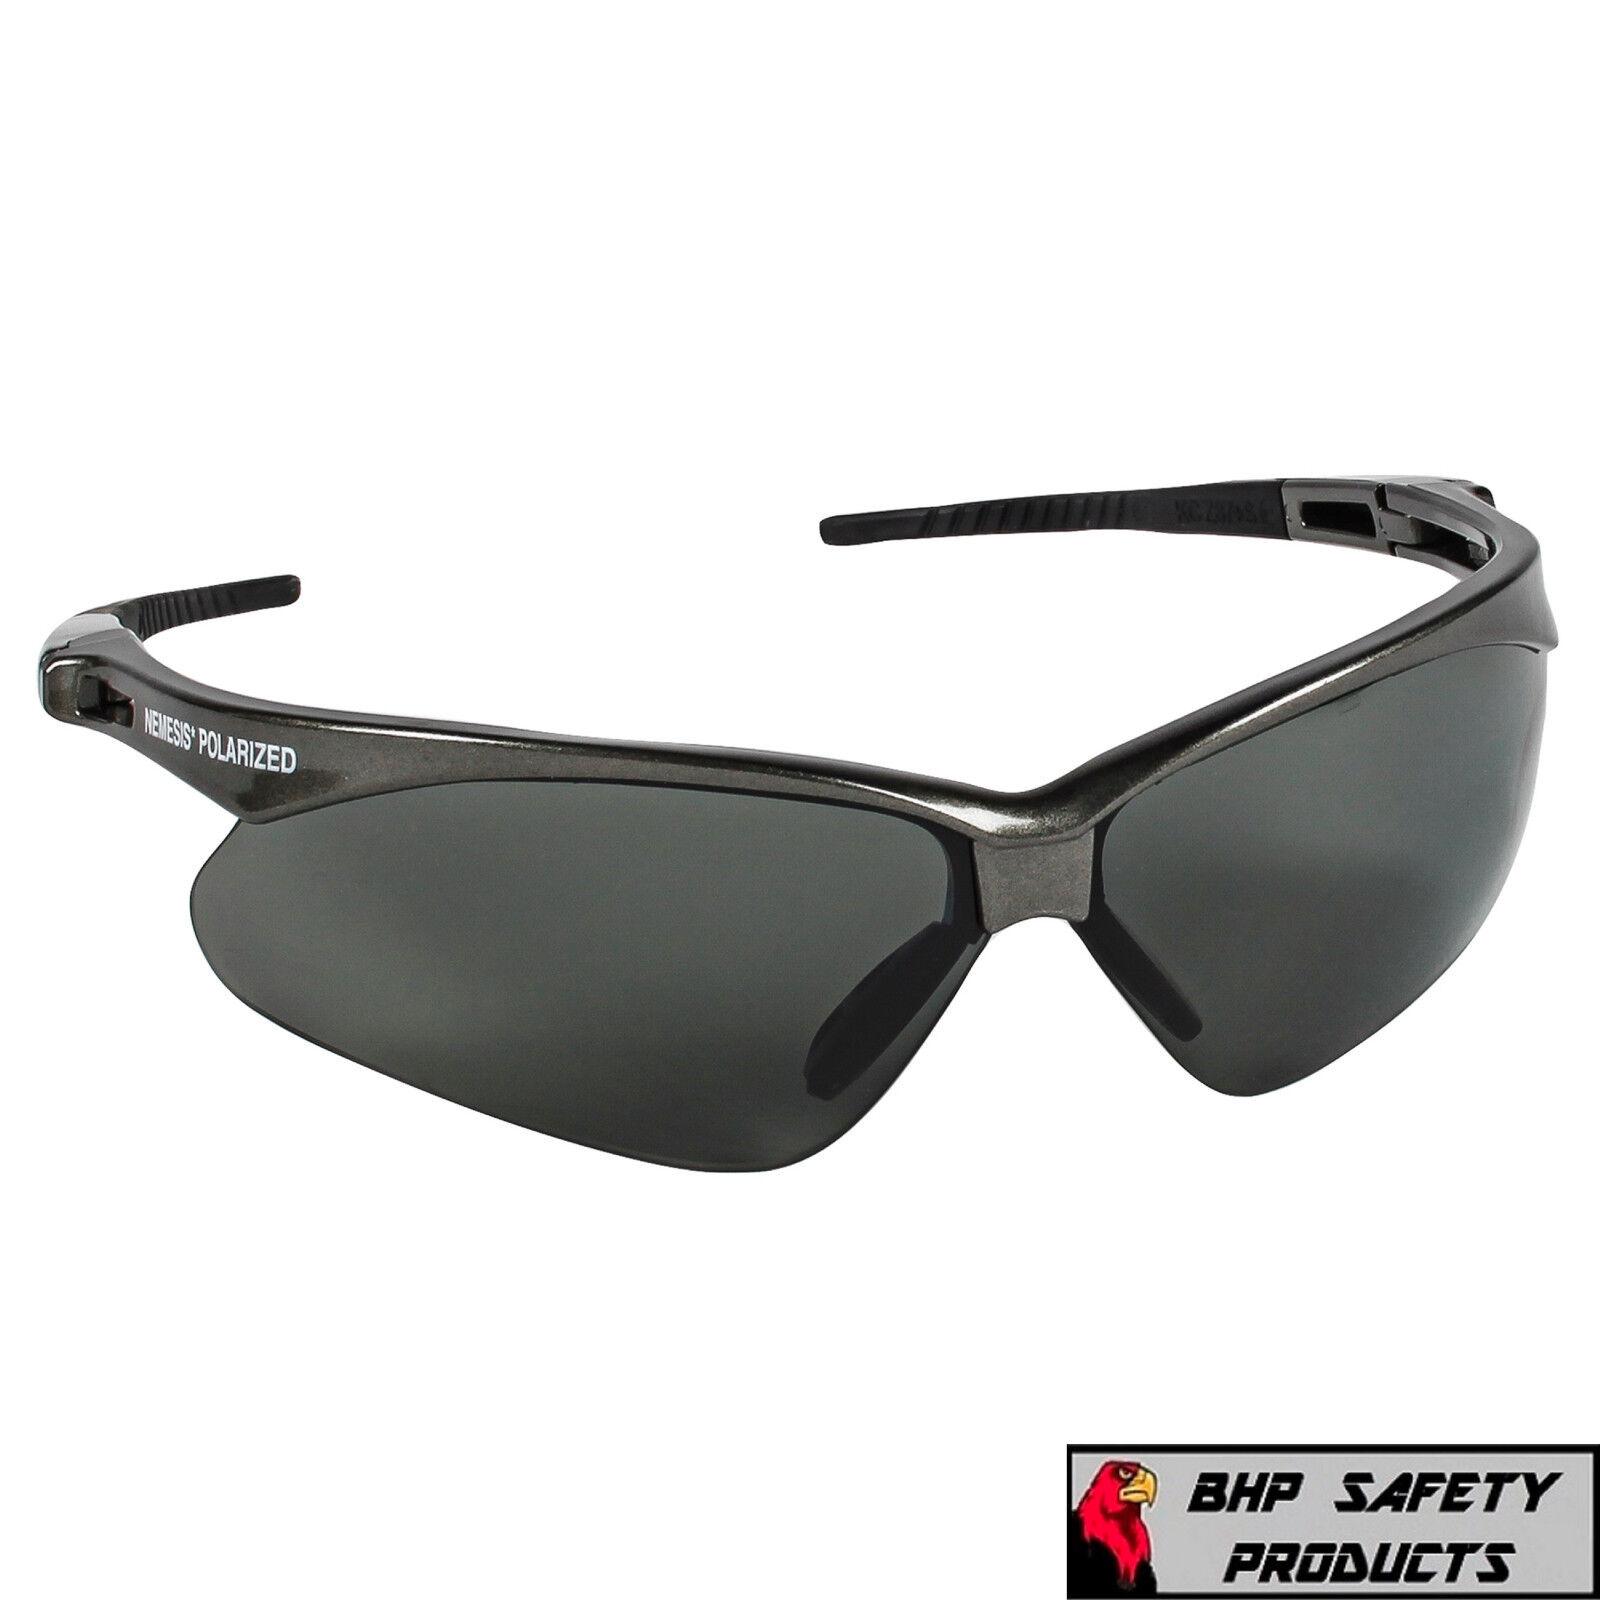 JACKSON NEMESIS SAFETY GLASSES SUNGLASSES SPORT WORK EYEWEAR ANSI Z87 COMPLIANT 28635- Gray Frame/Polarized Smoke Lens